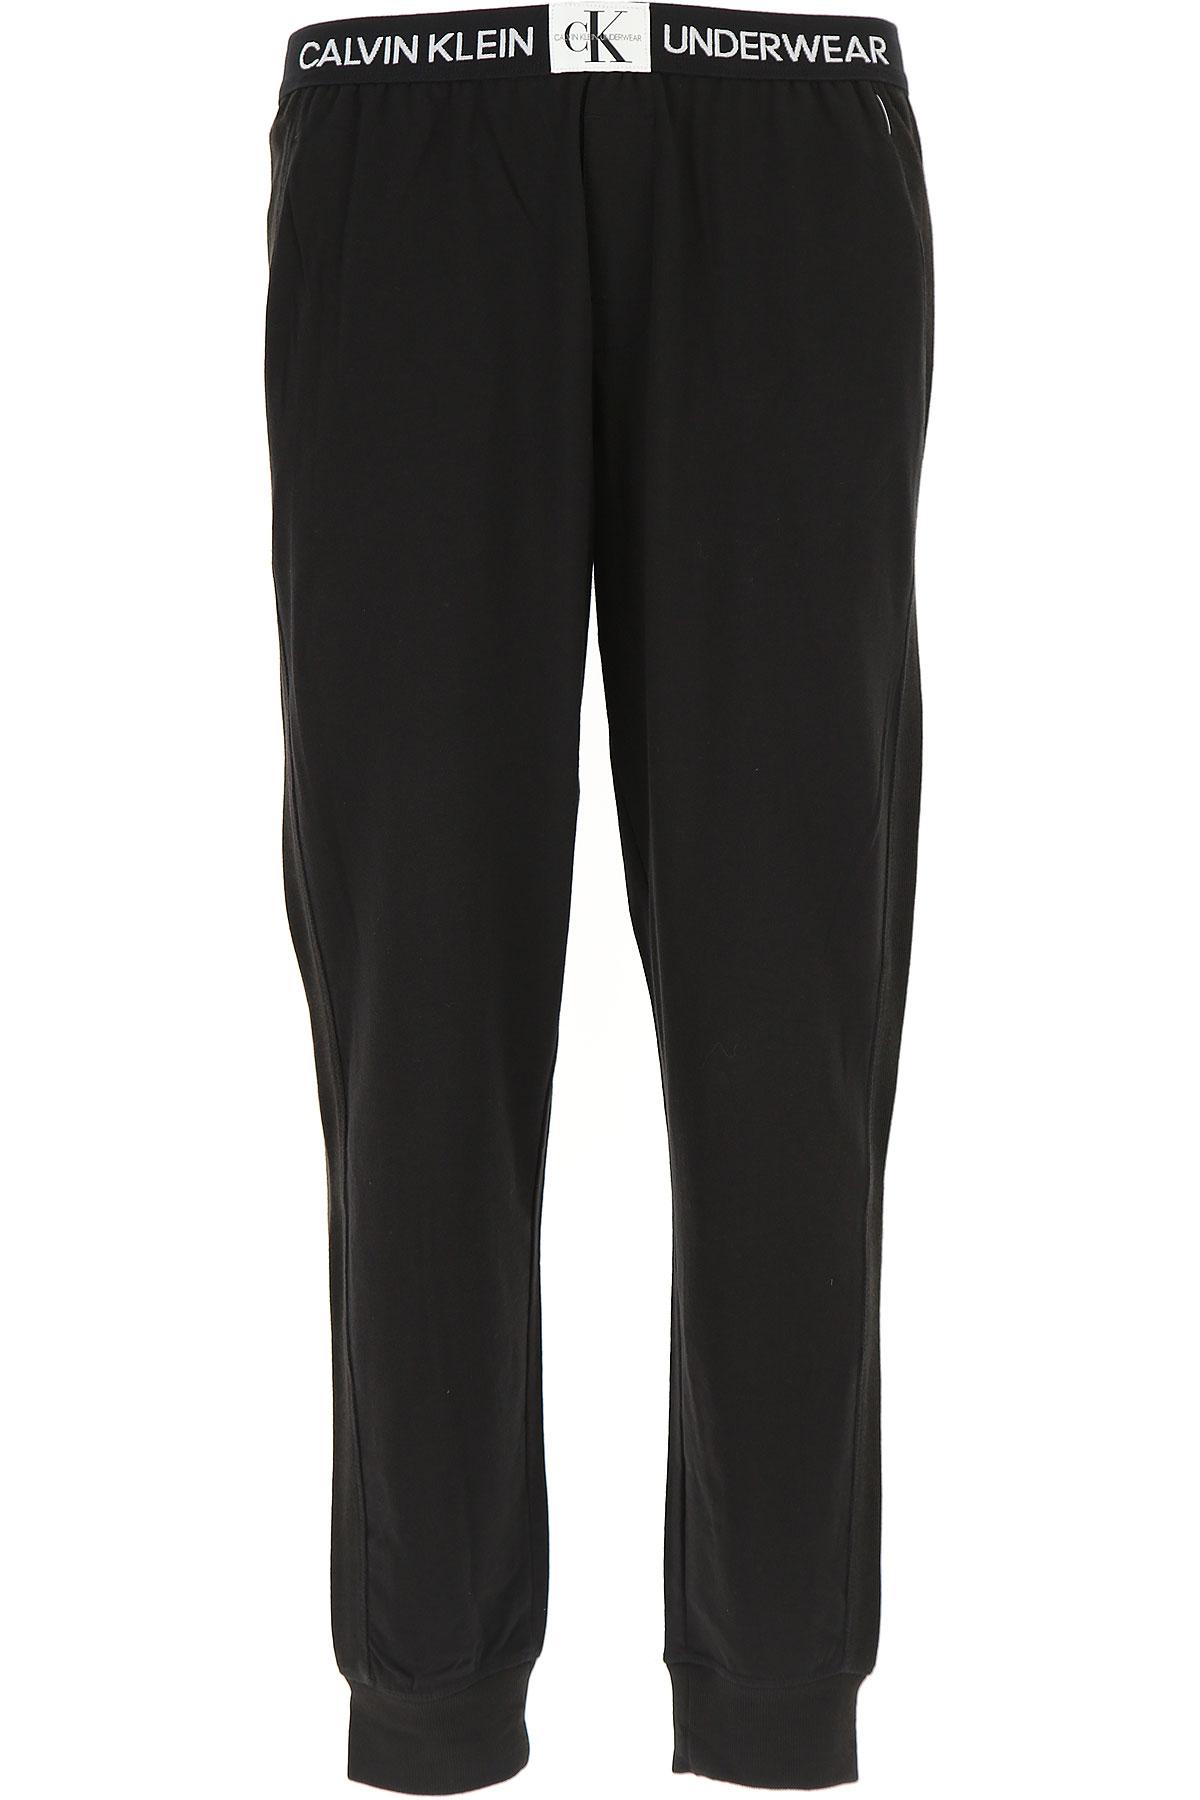 Image of Calvin Klein Mens Underwear, Black, Cotton, 2017, S (EU 3) M (EU 4) L (EU 5) XL (EU 6)